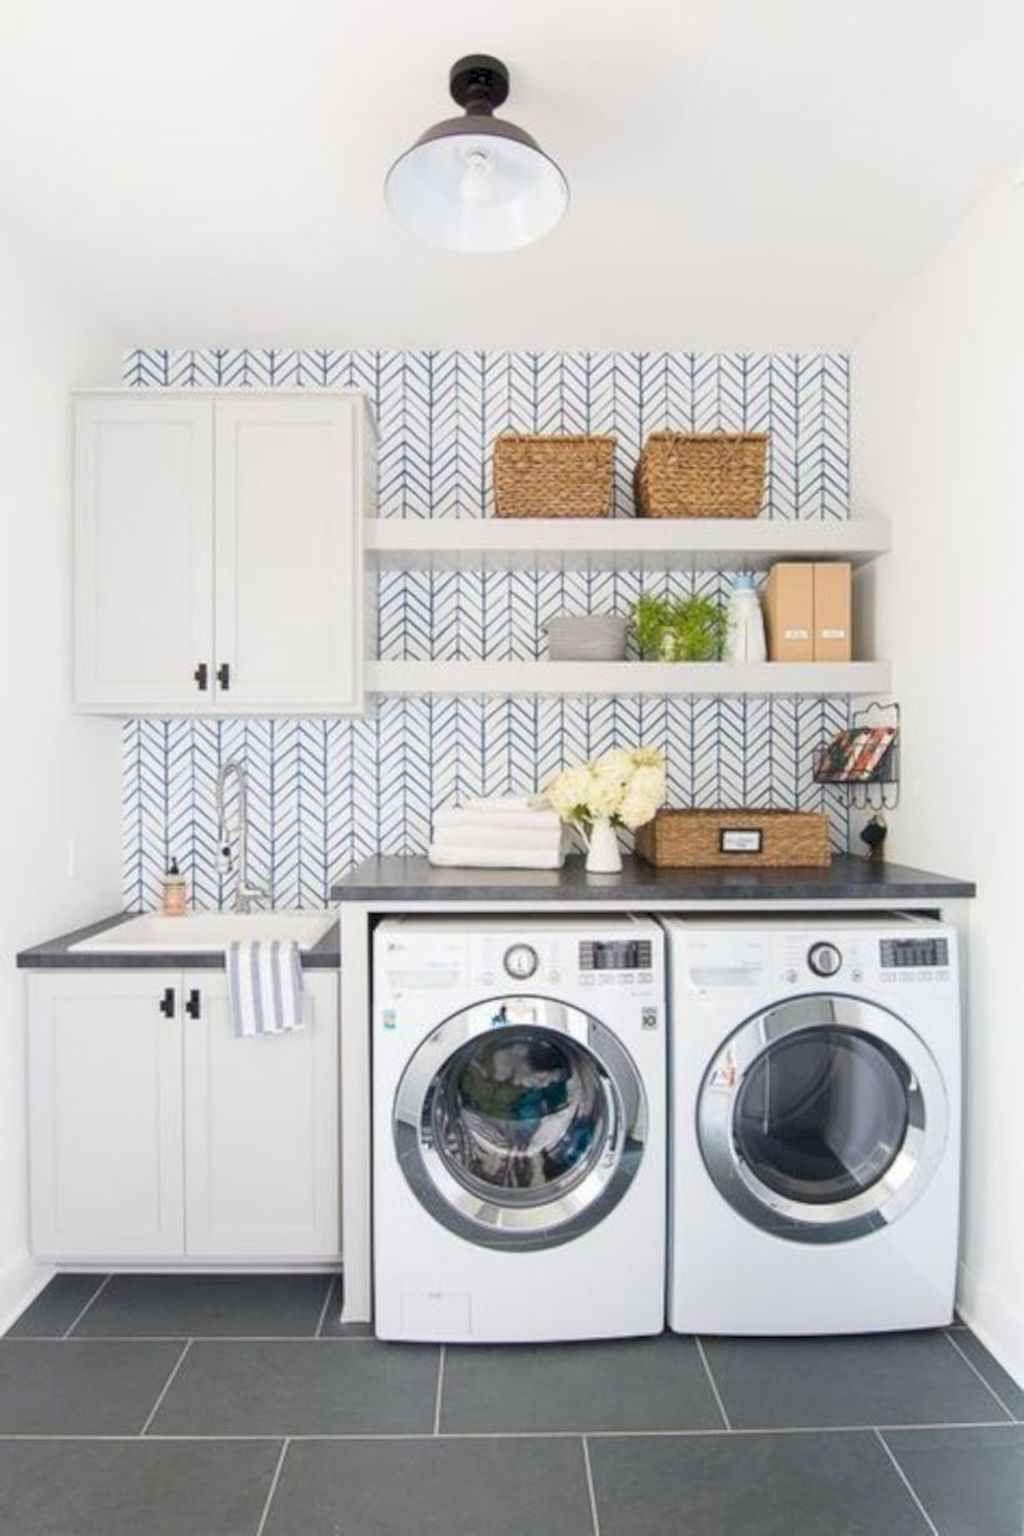 55 Diy Laundry Room Storage Shelves Ideas In 2020 Laundry Room